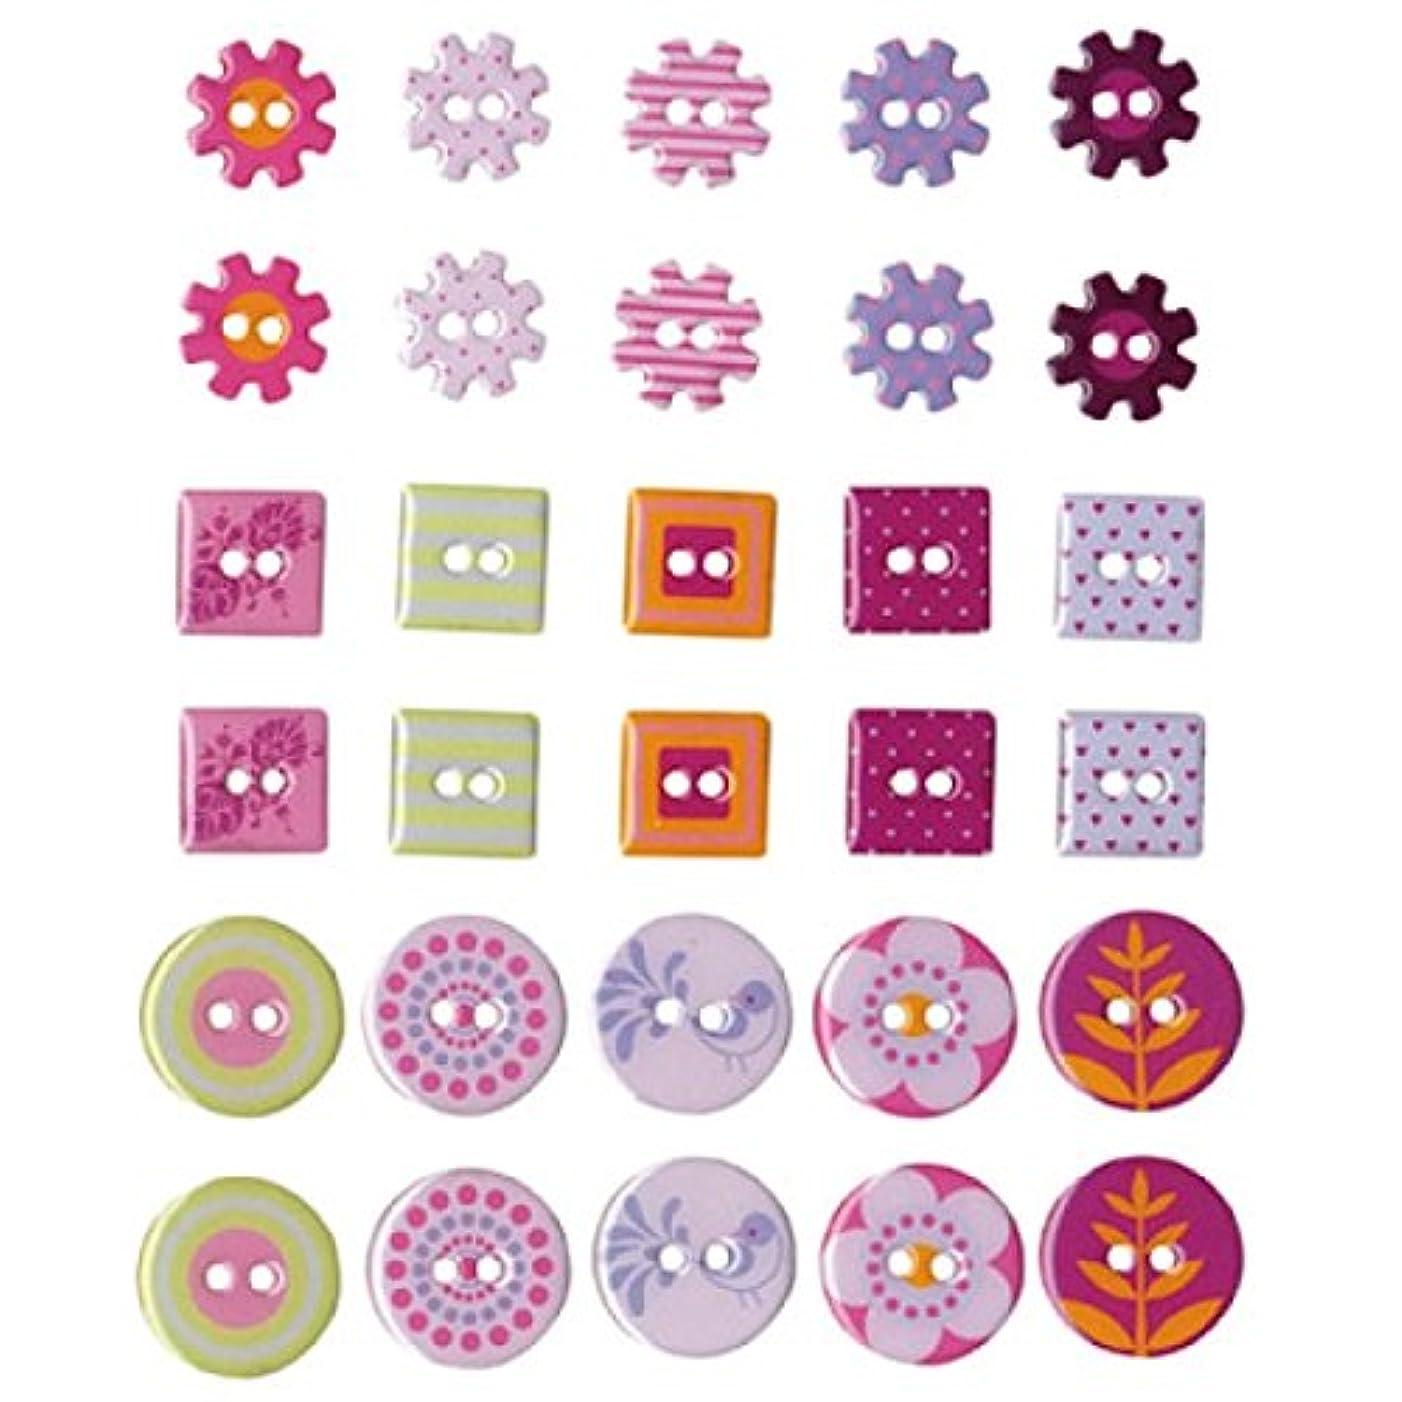 Artemio 11006439 30 Buttons in Epoxy Flowers